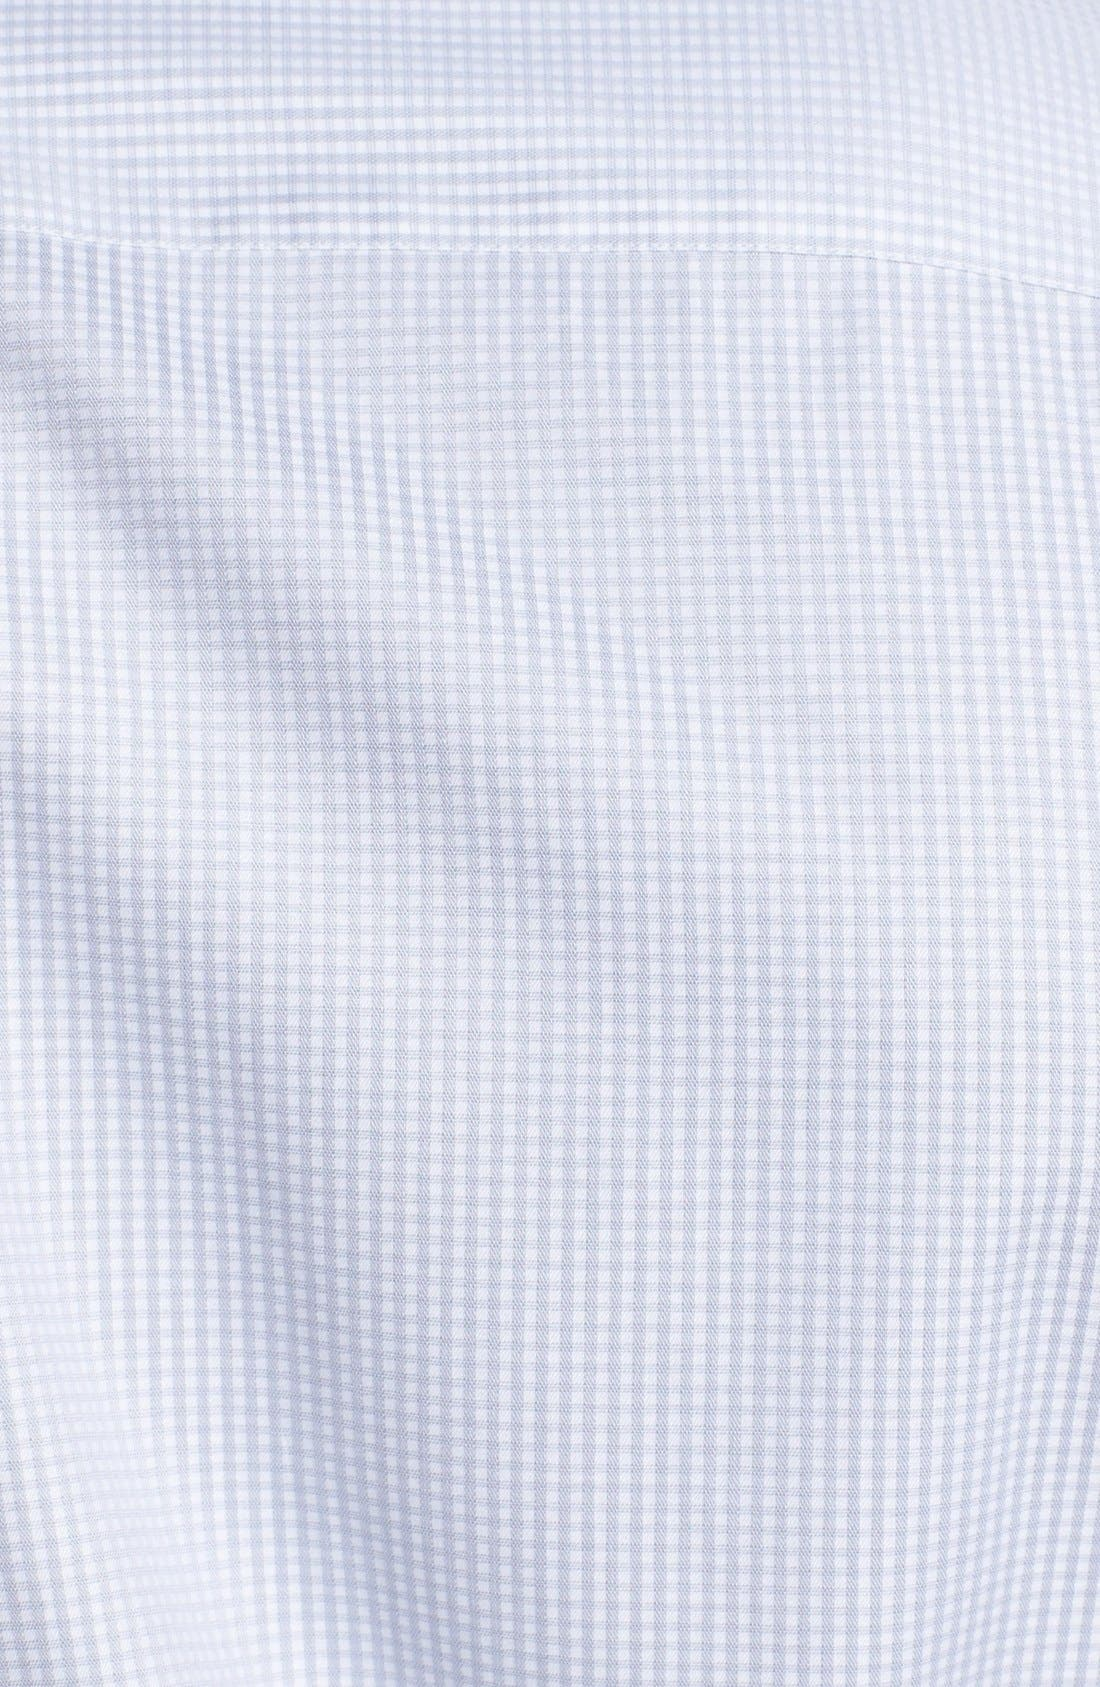 Alternate Image 3  - Z Zegna Slim Fit Microcheck Woven Shirt